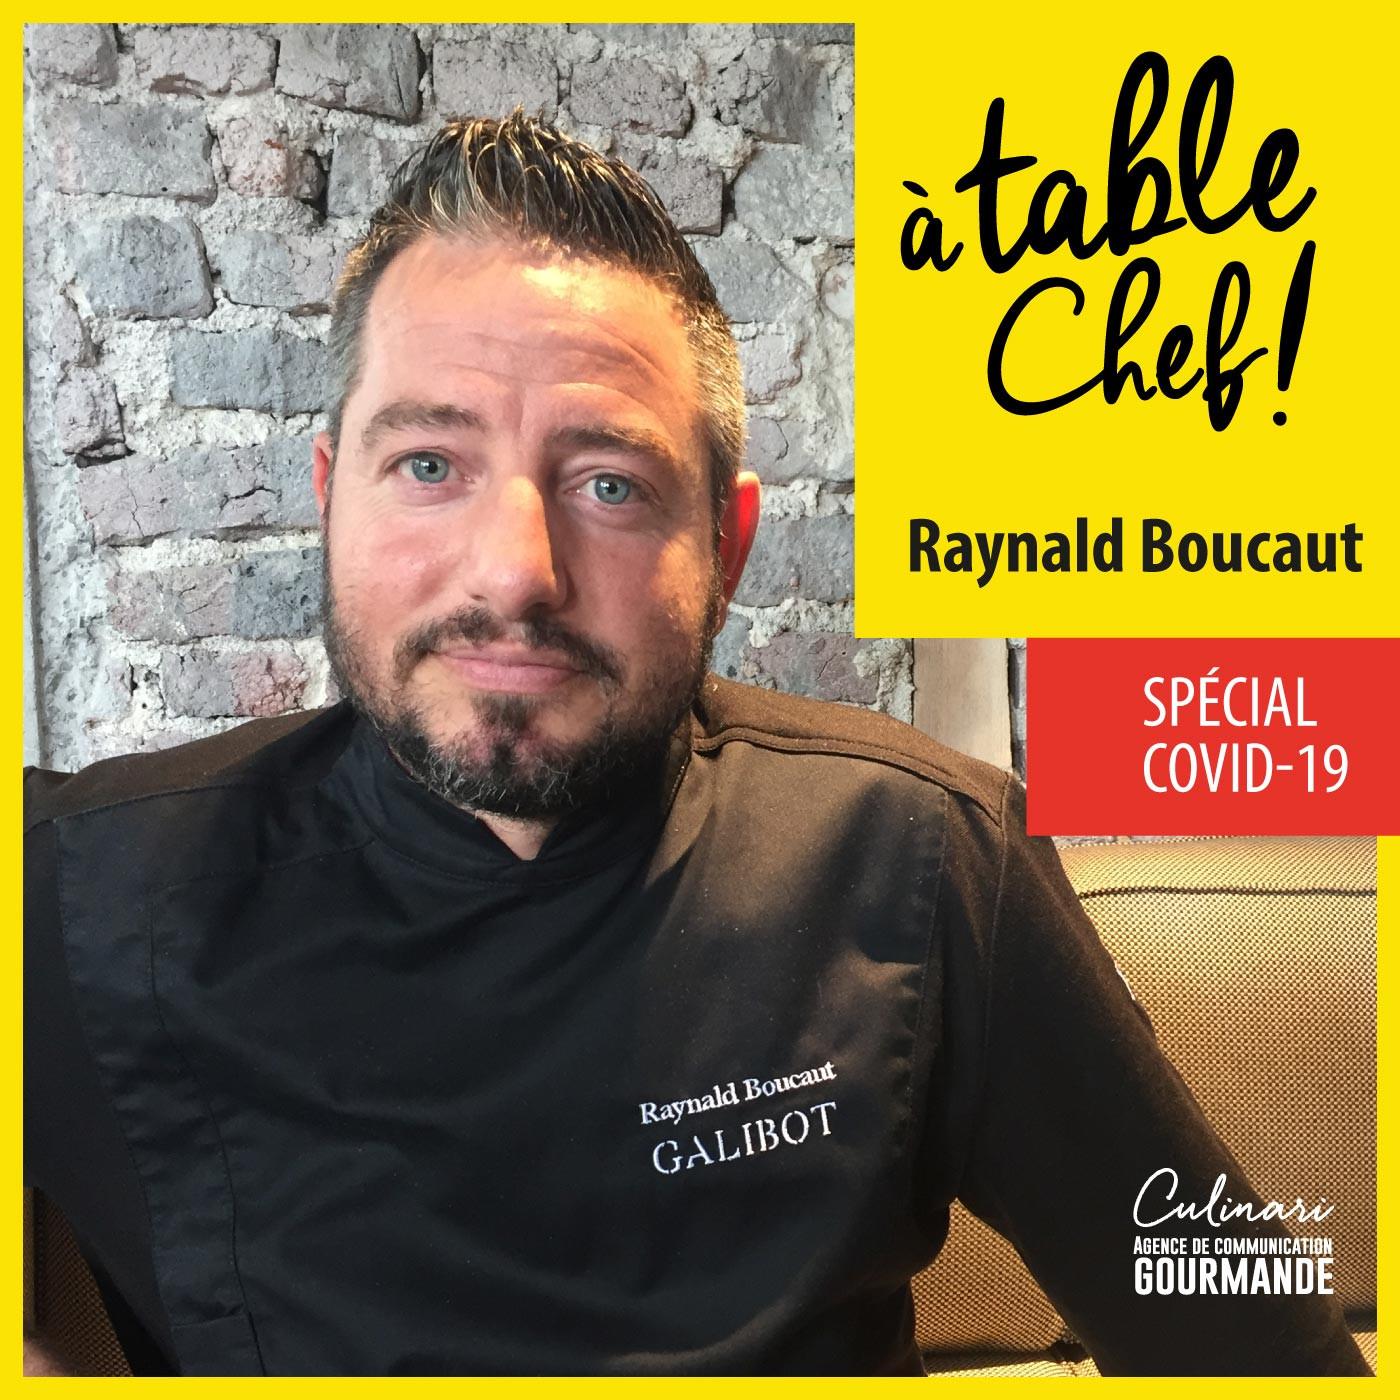 Chef Raynald Boucaut